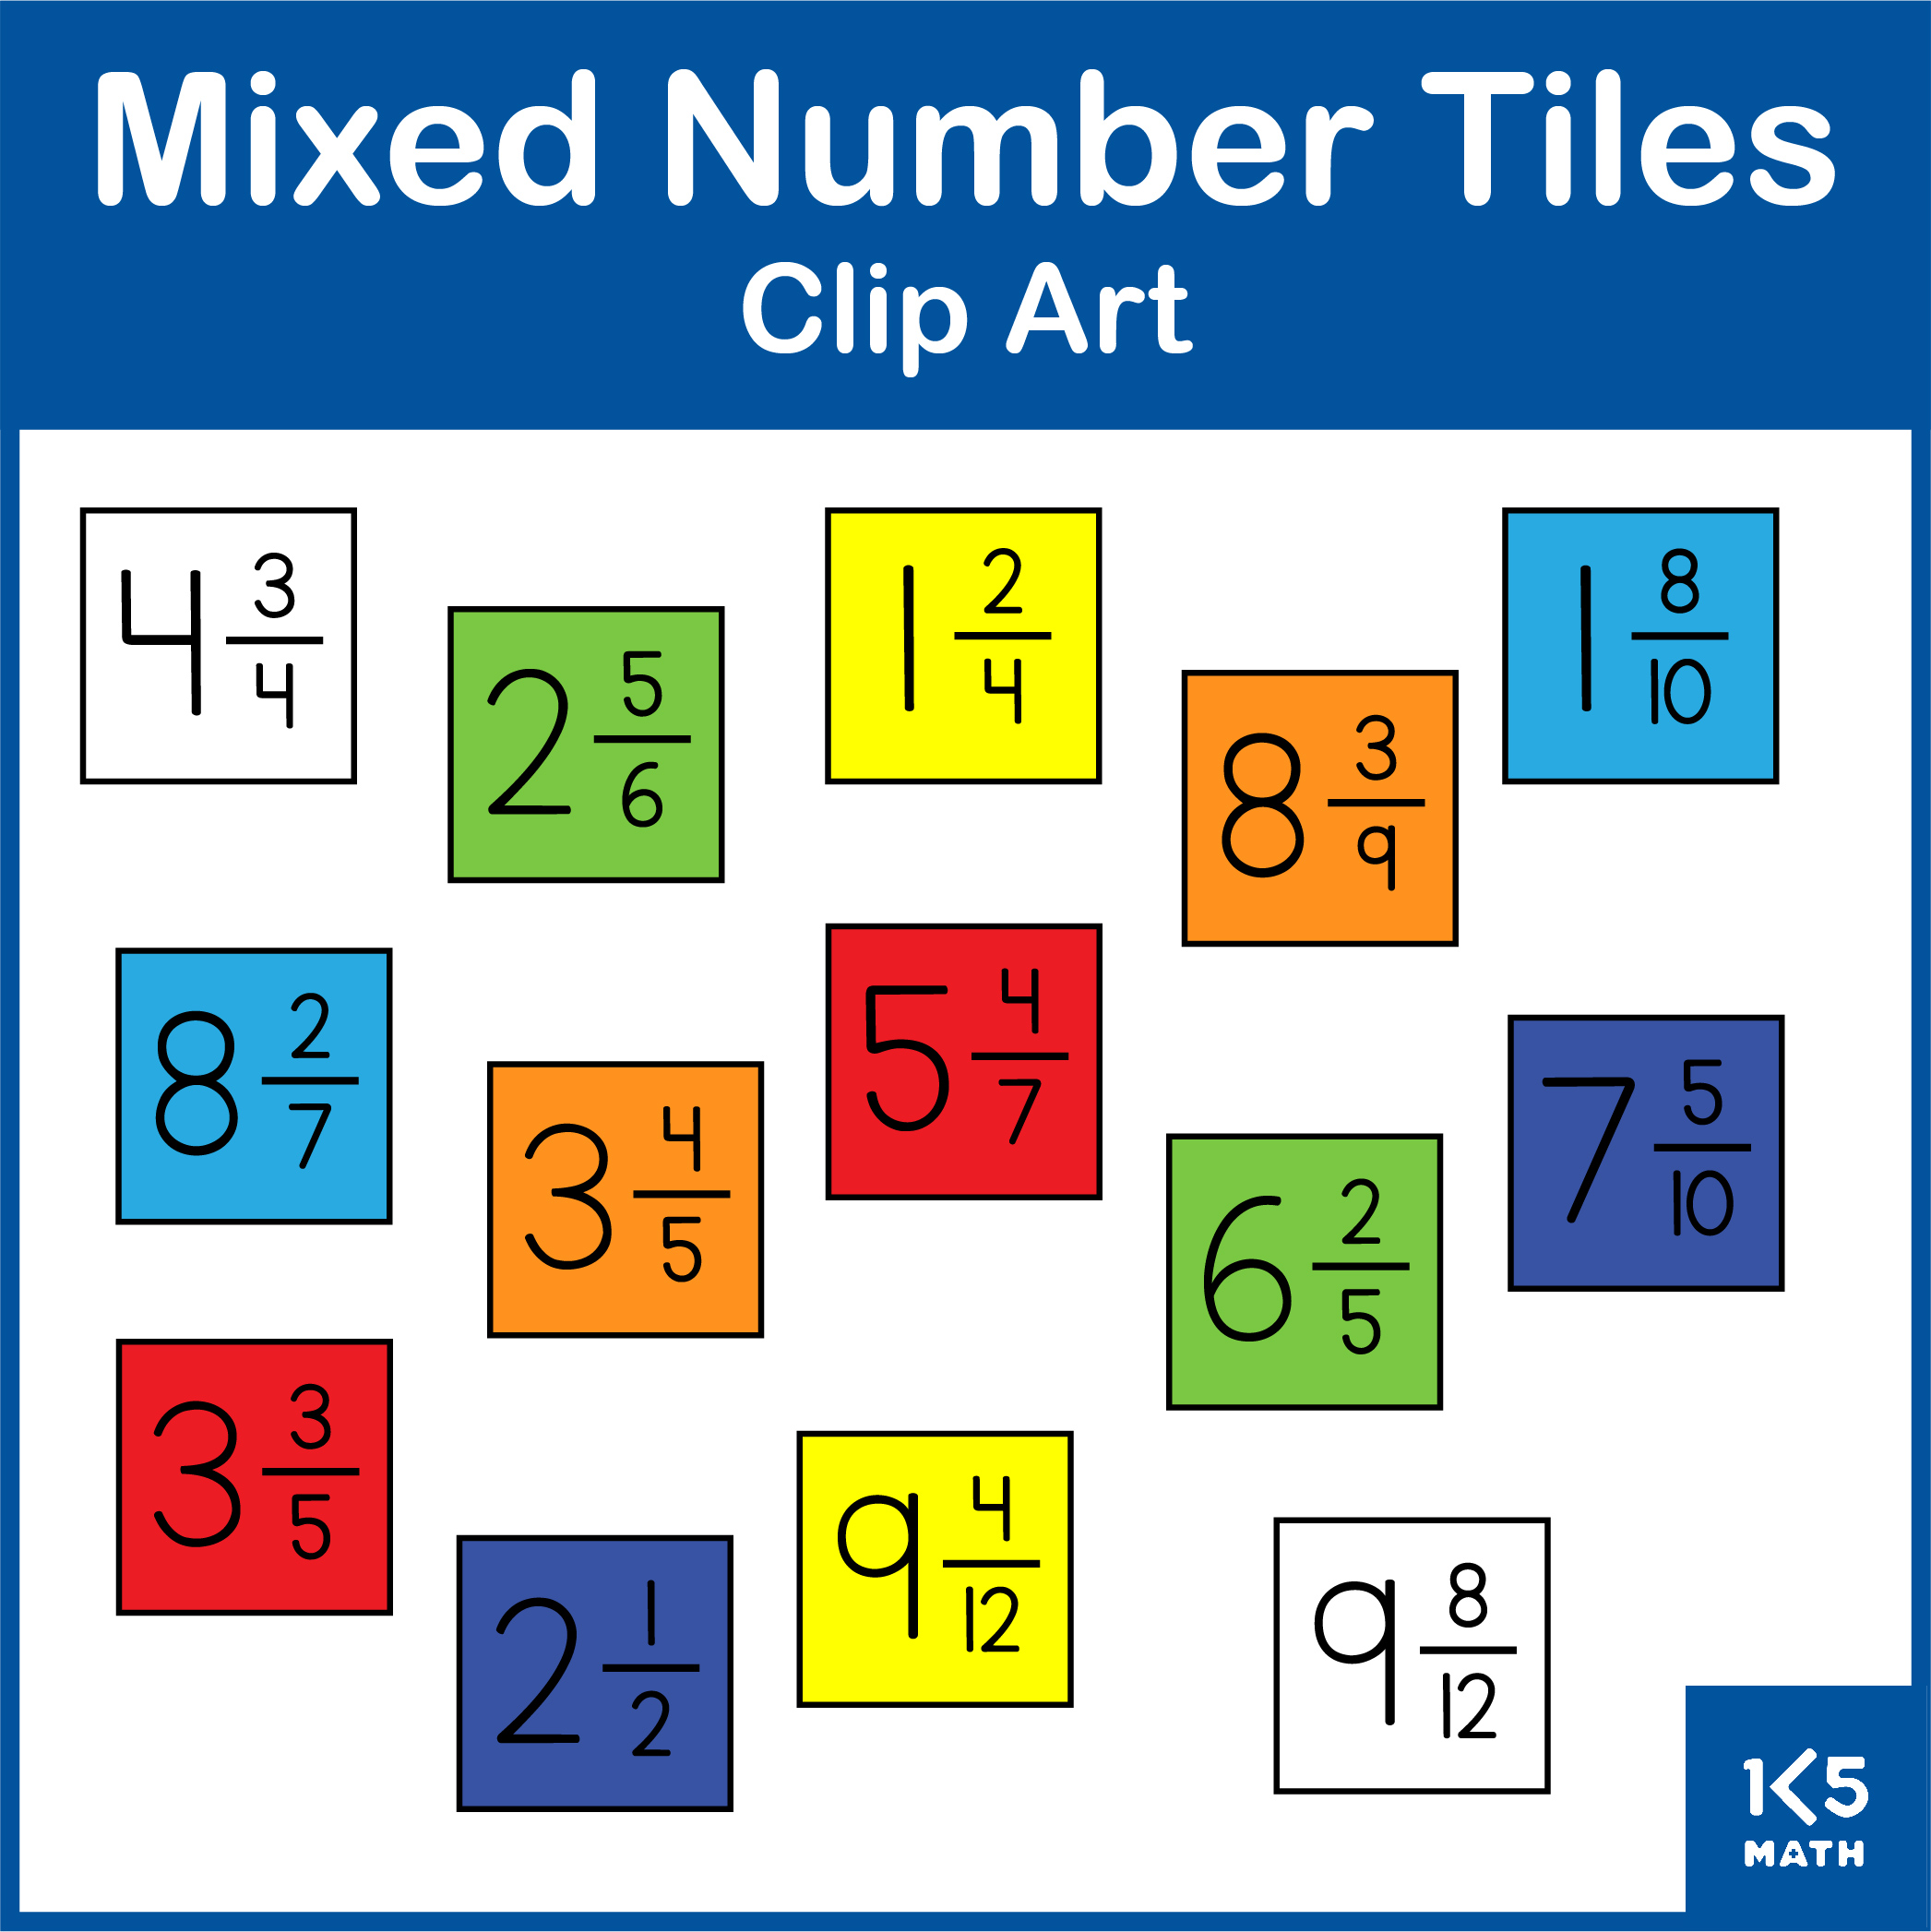 Mixed Number Tiles Clip Art